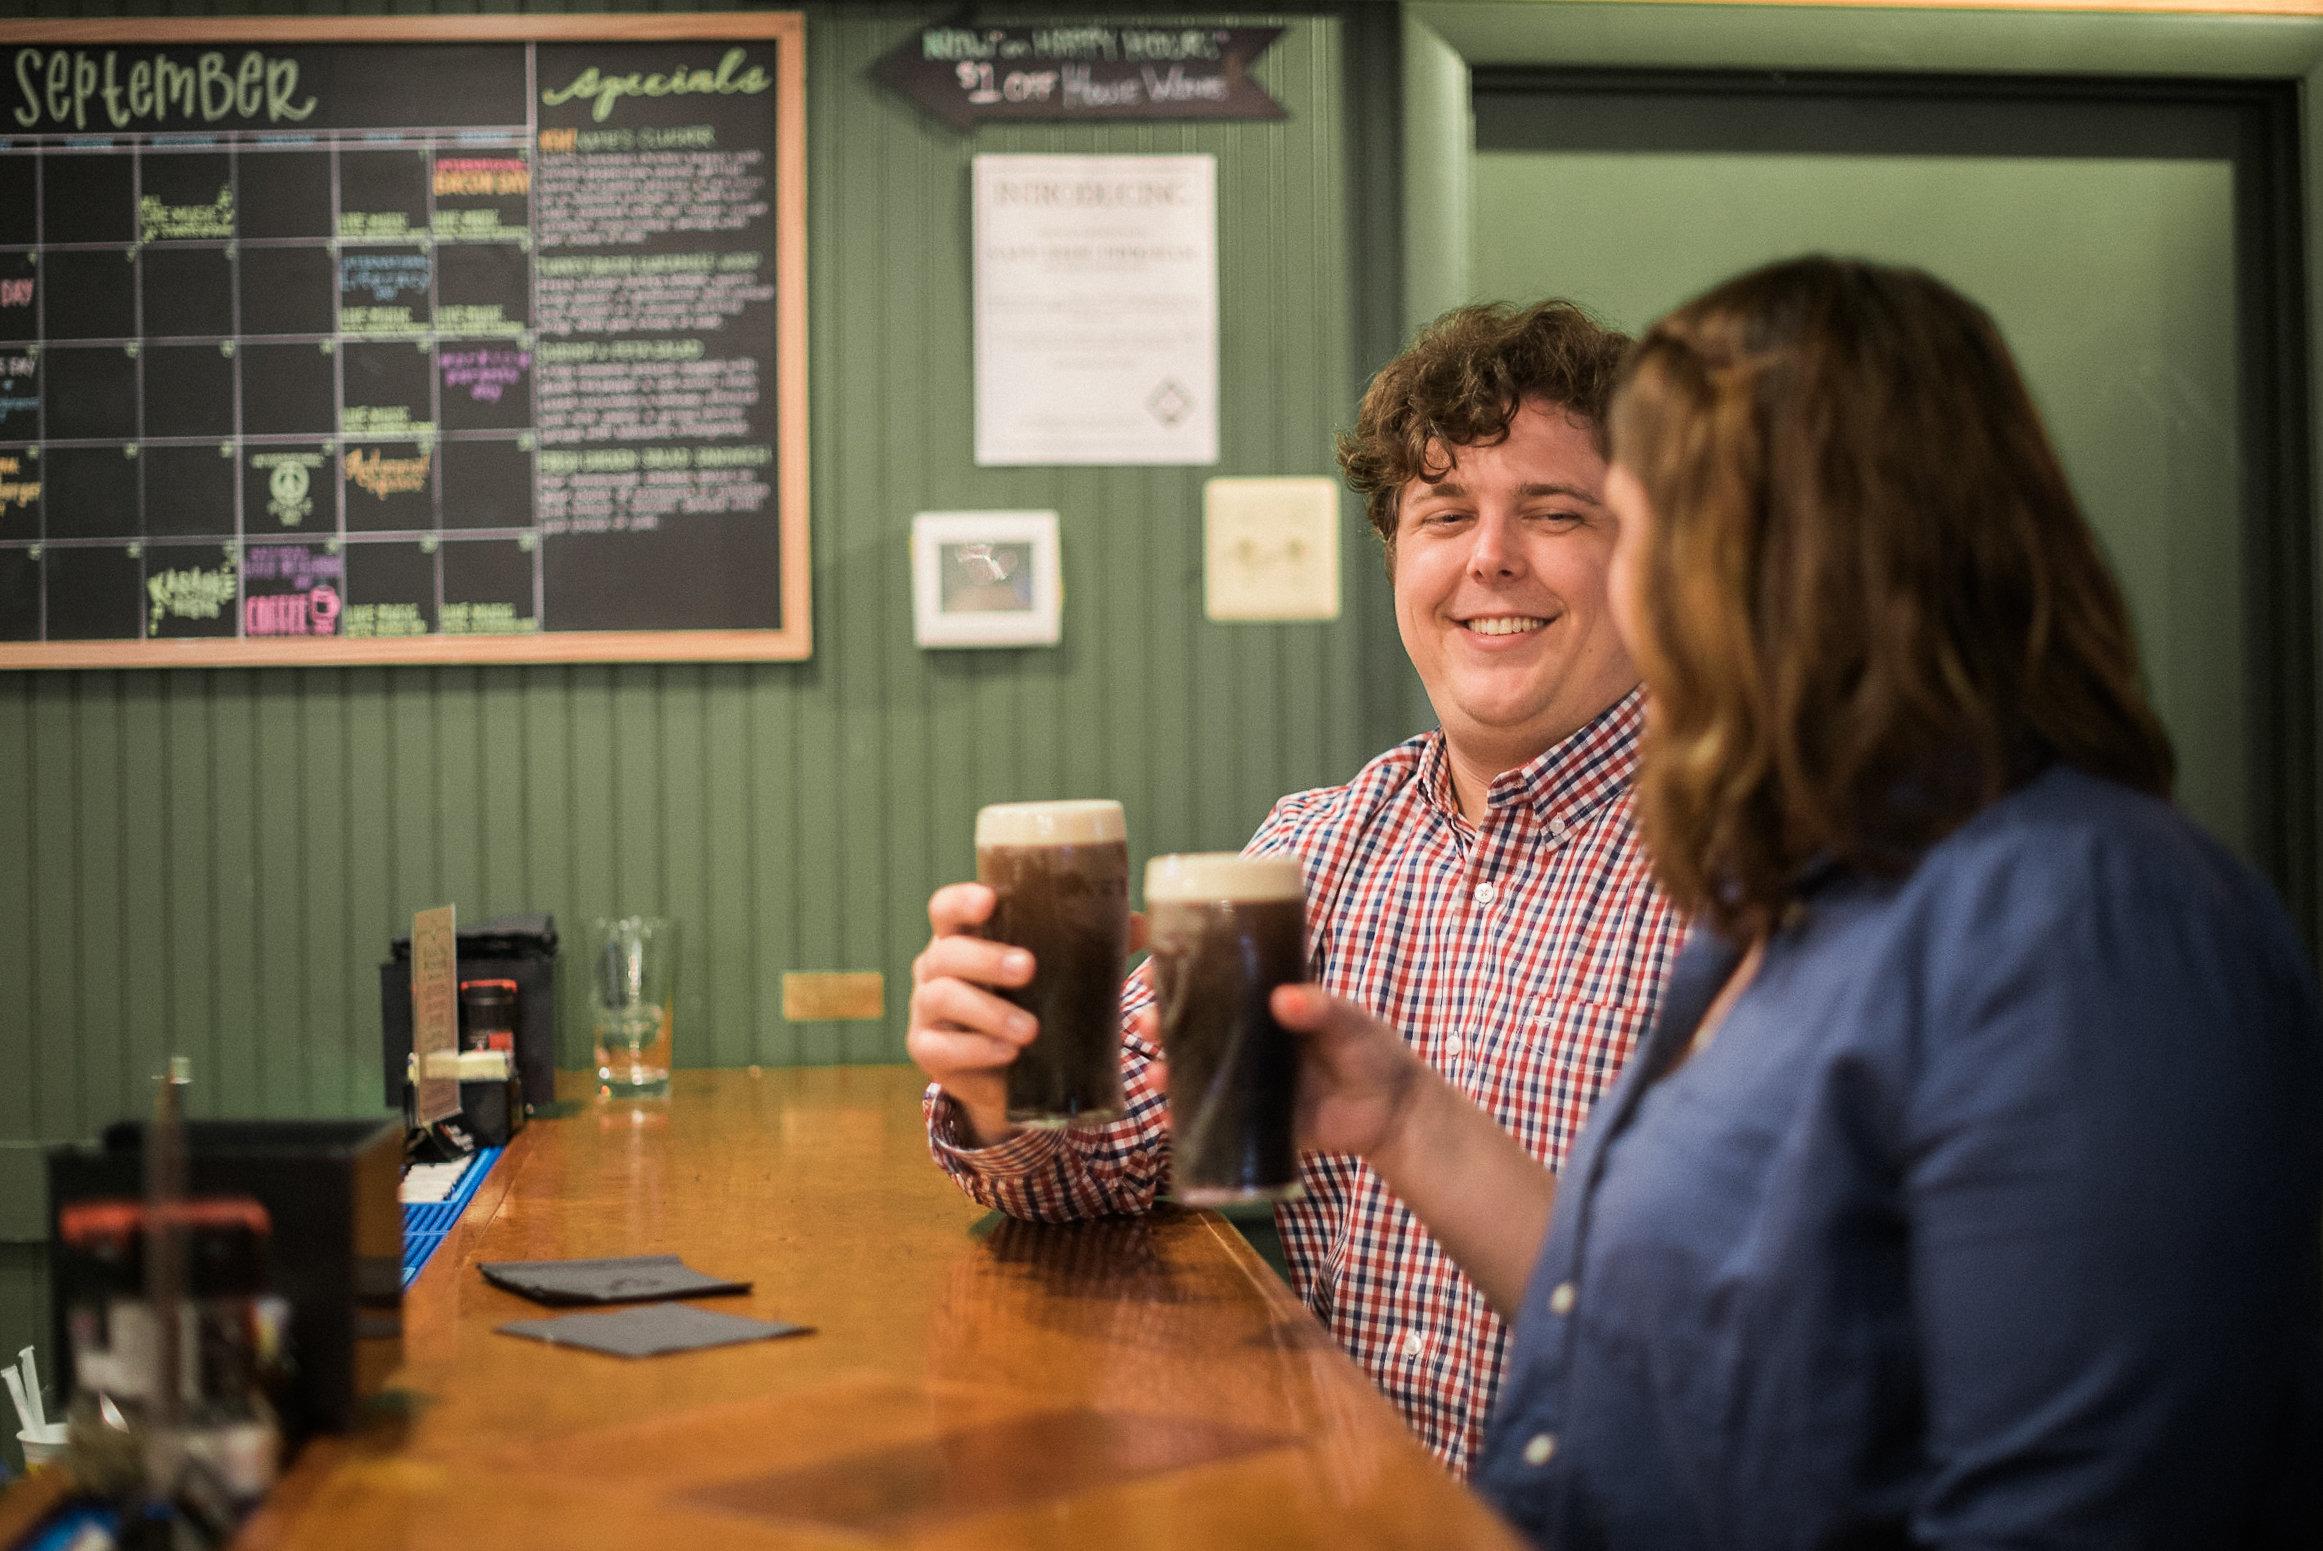 Man smiling at woman in soda shop